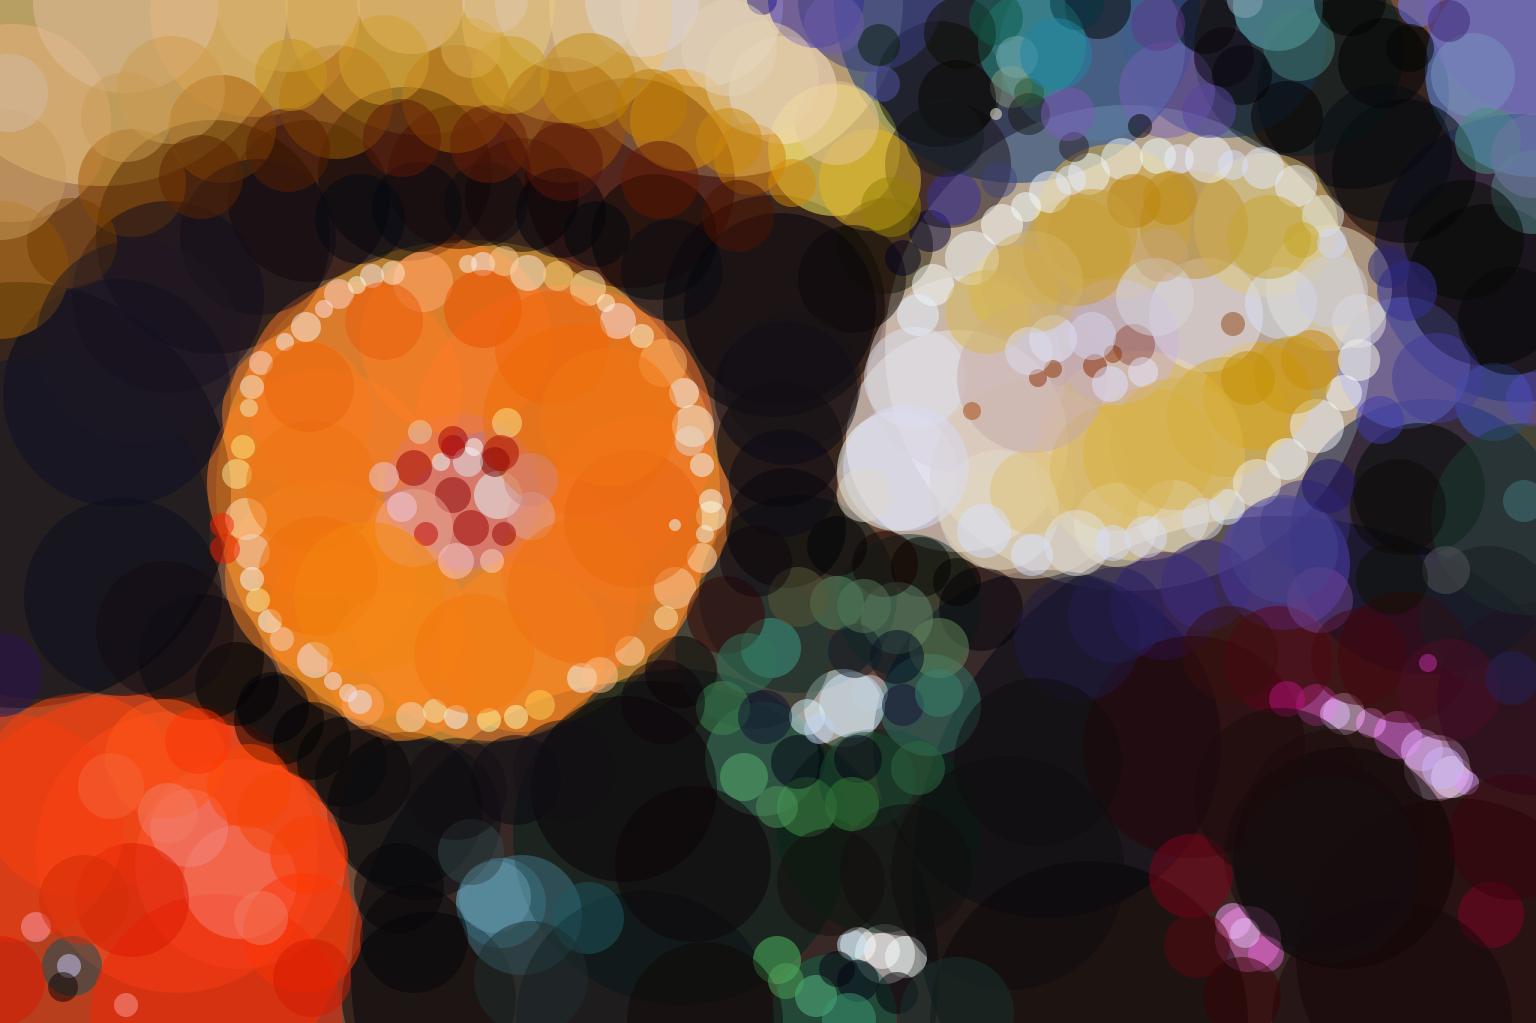 Geometrized Sliced Fruit - 500 circles